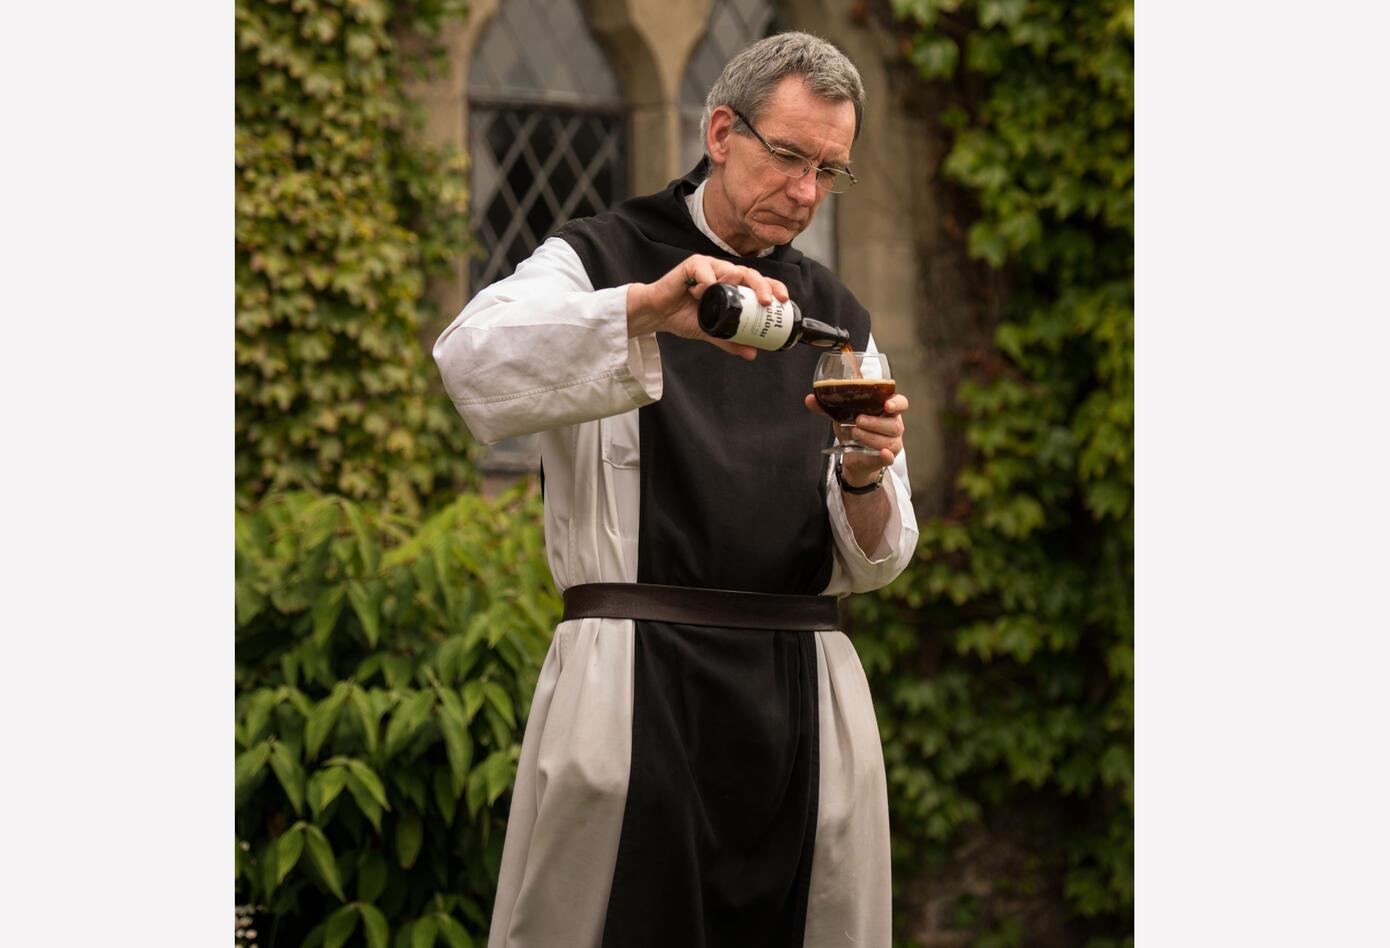 Esta es la historia de los monjes productores de cerveza.